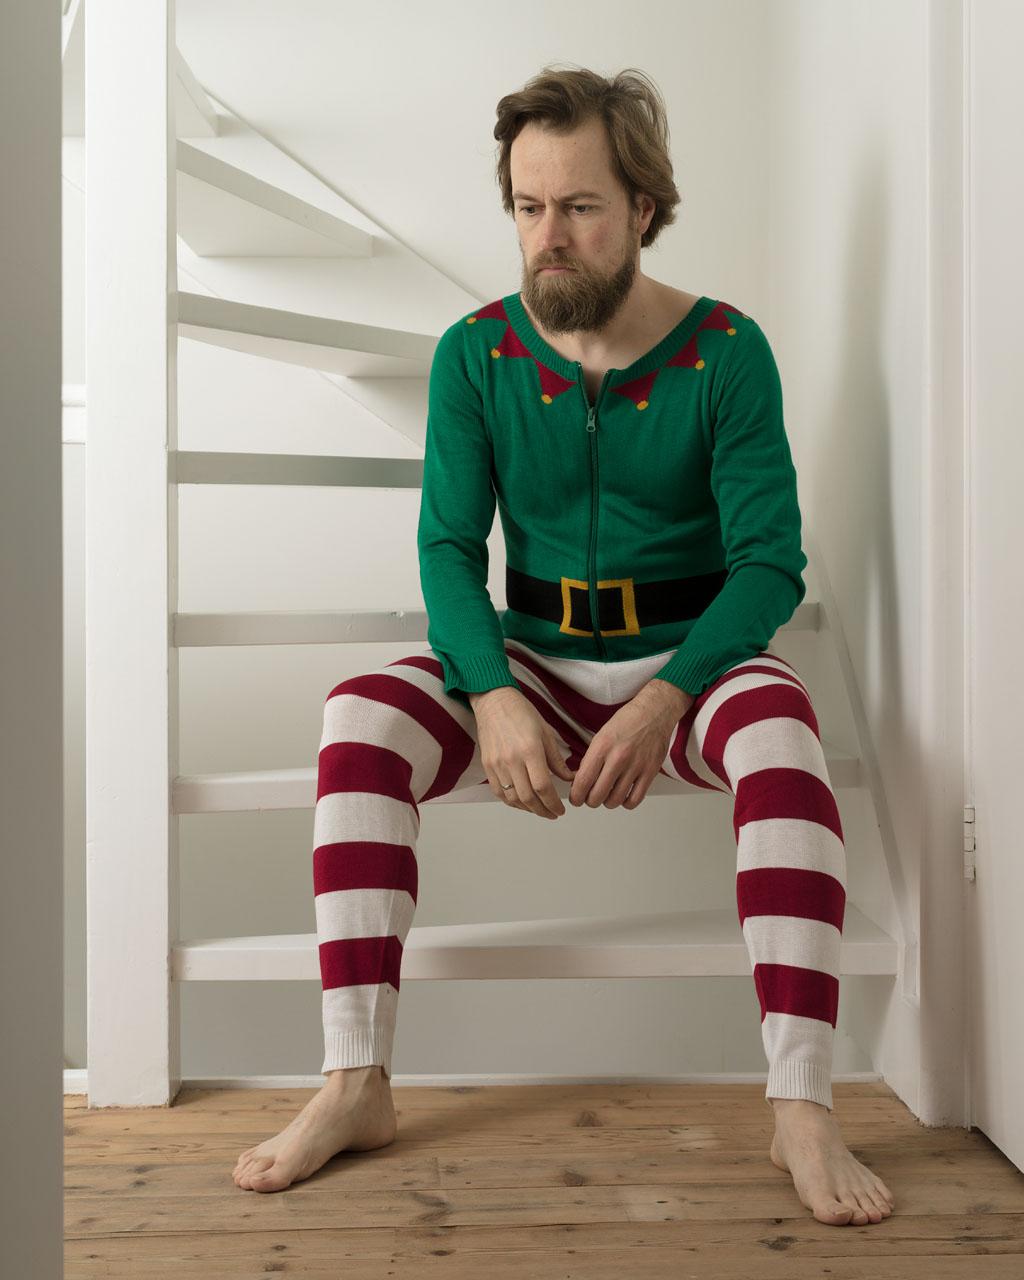 Christmassy self portrait